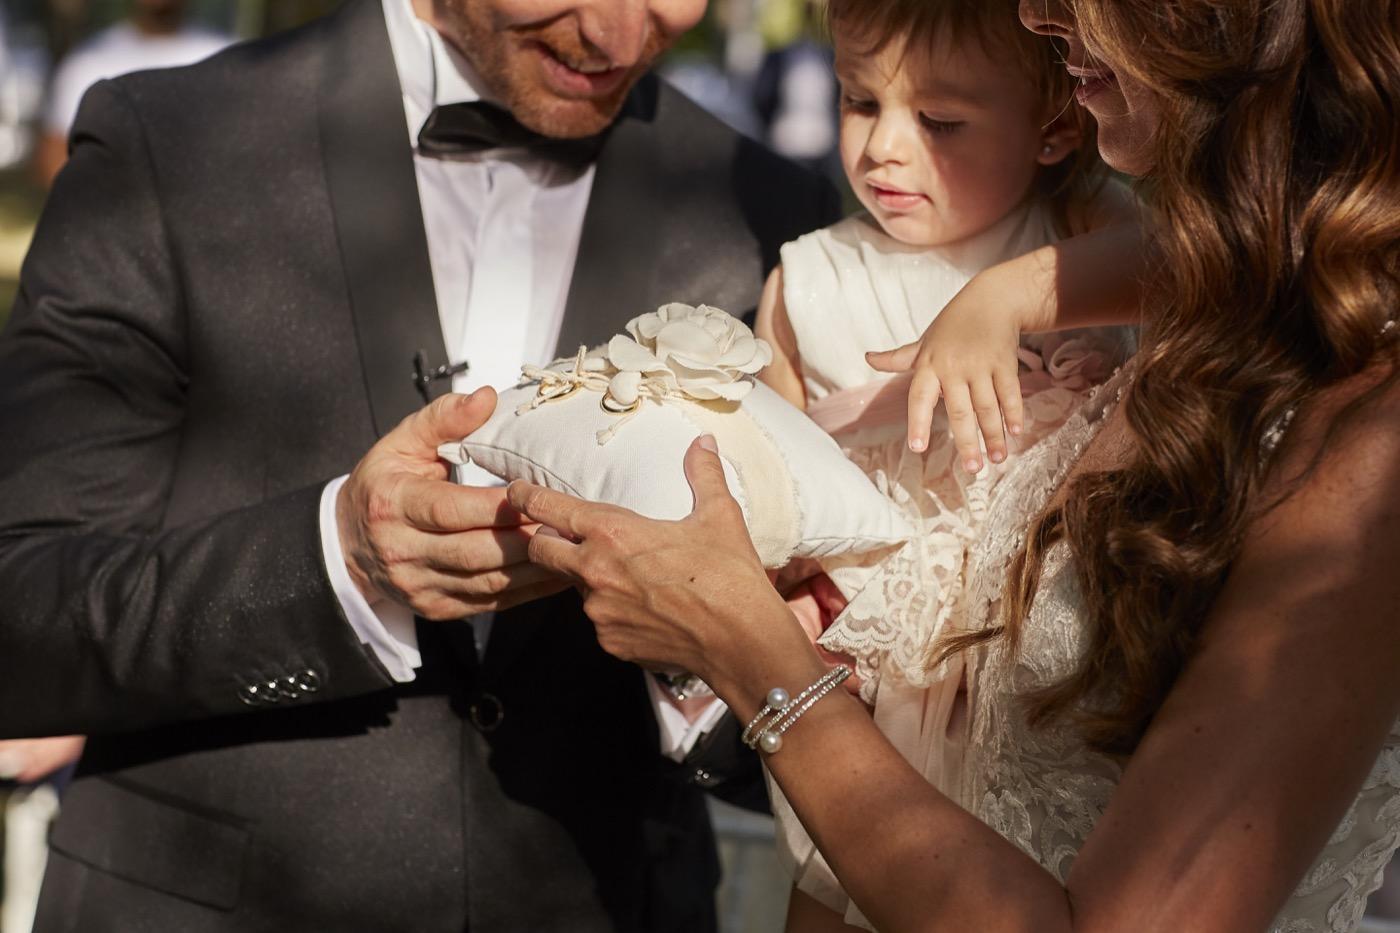 Claudio-Coppola-wedding-photographer-la-scuderia-eventi-preparativi-la-rosetta-perugia-56